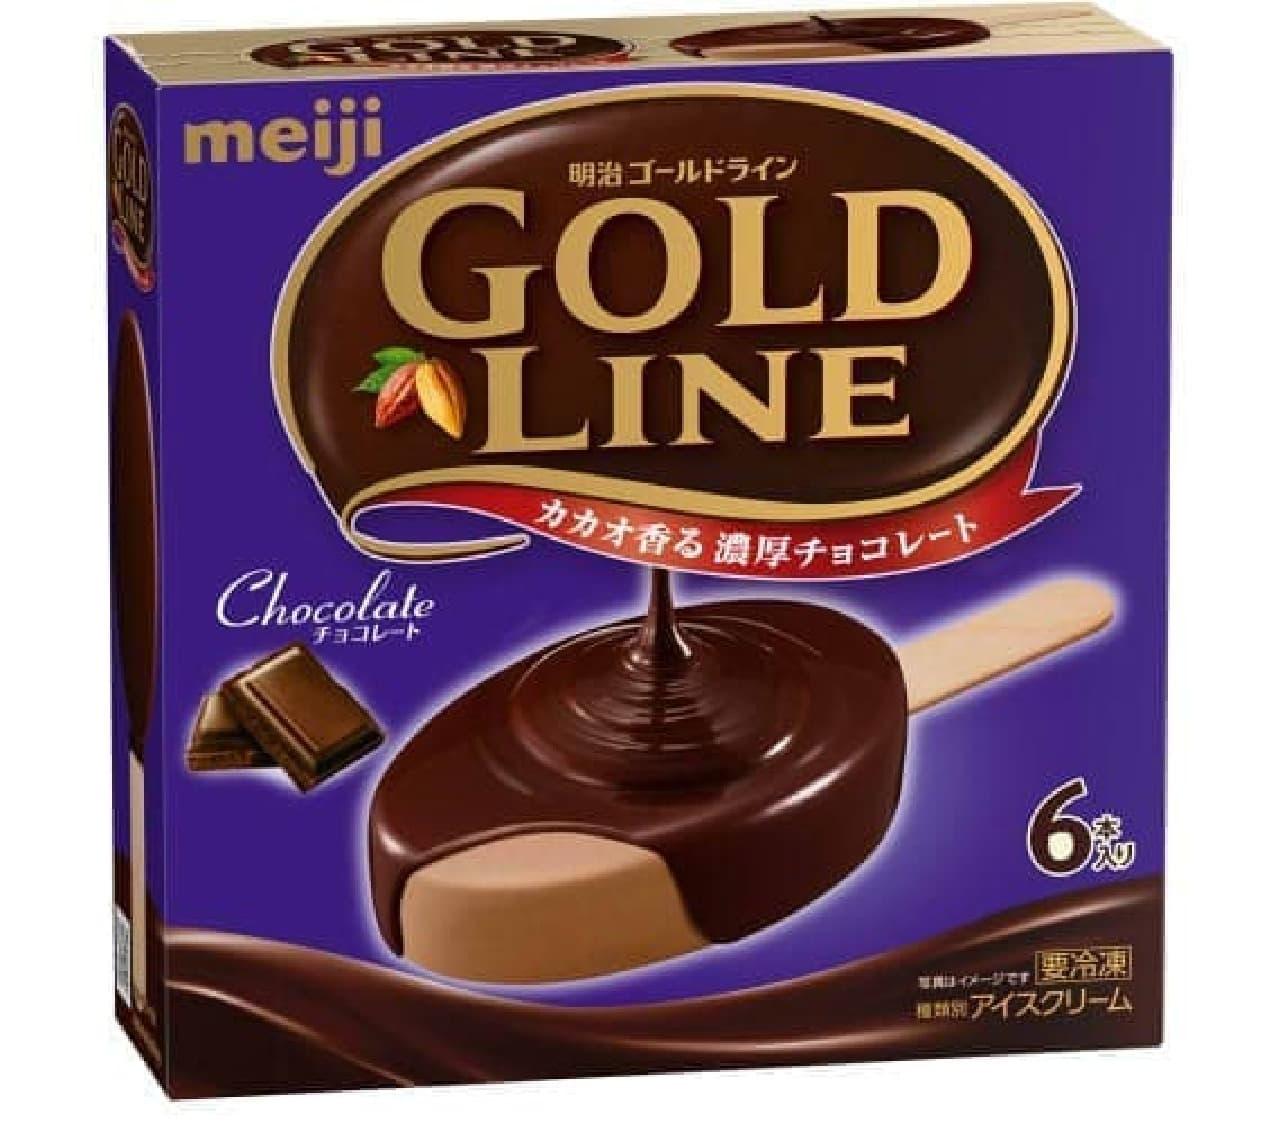 meiji GOLD LINE チョコレート